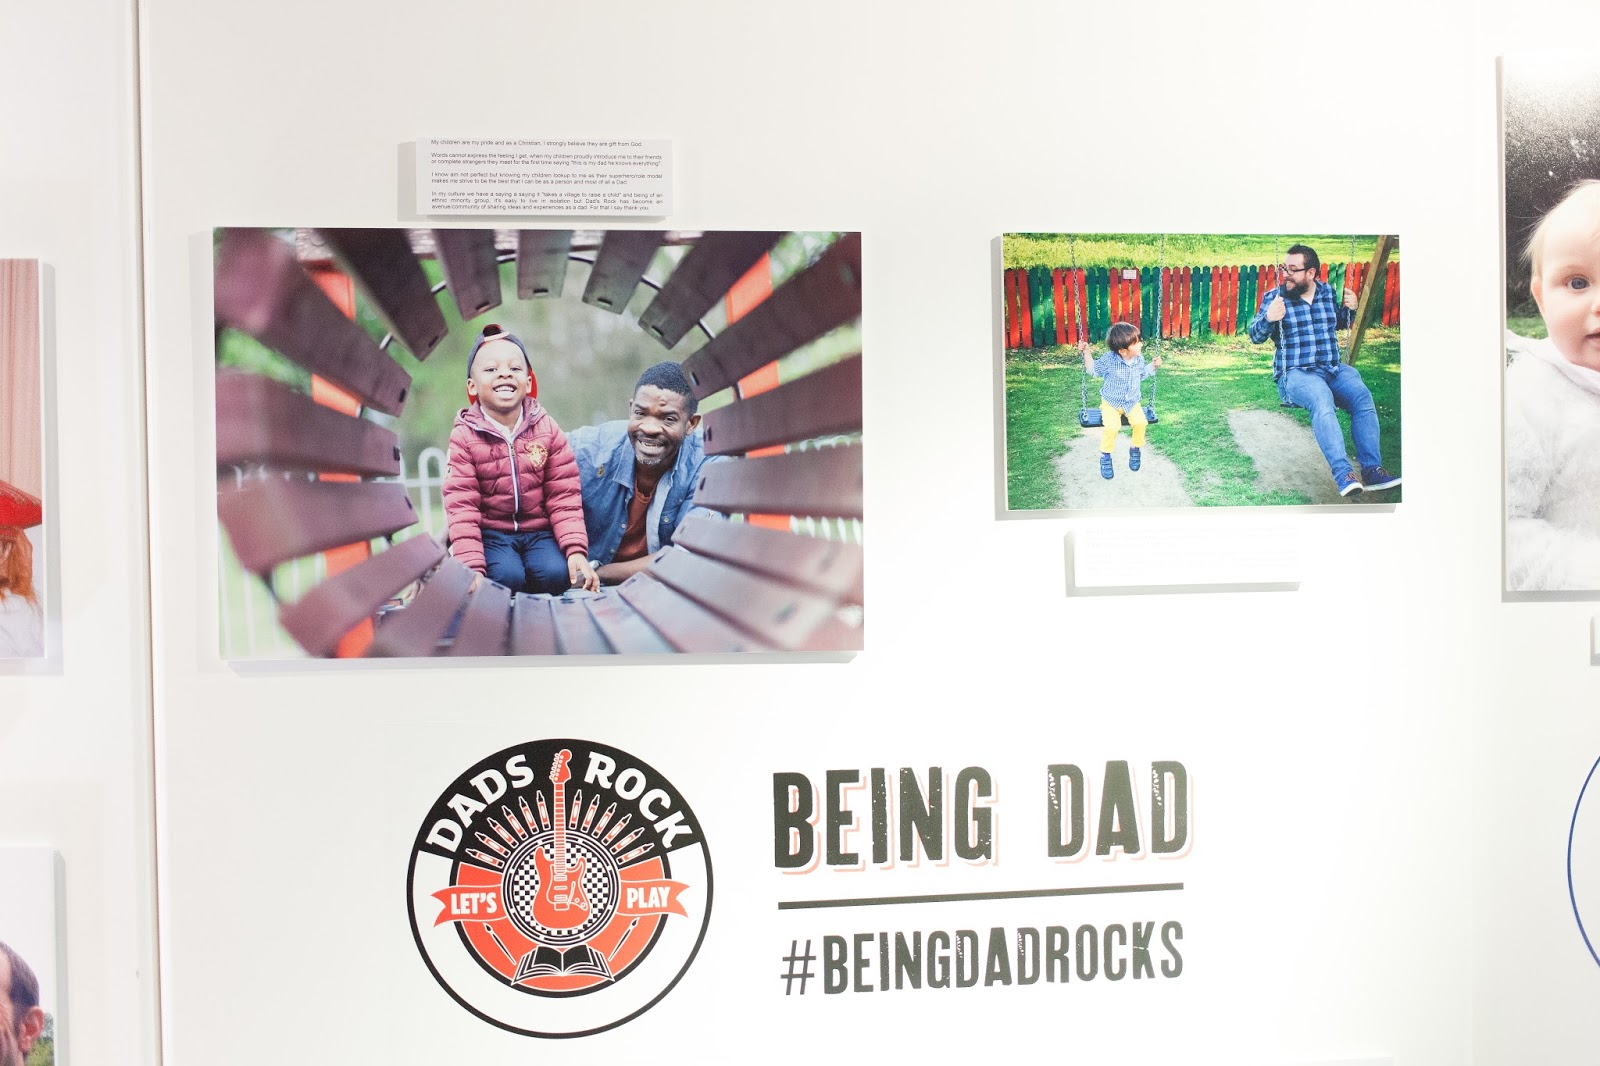 Being_Dad-17.jpg